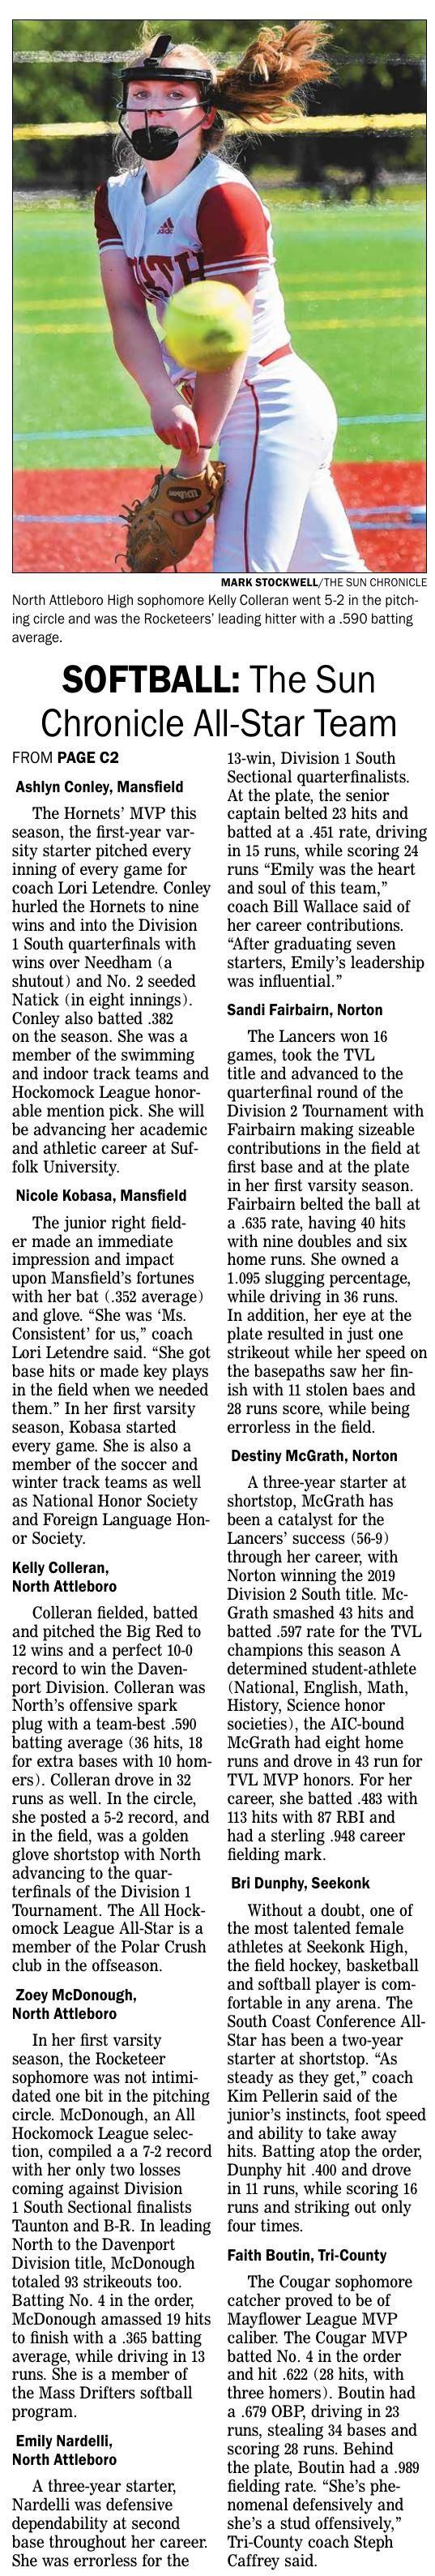 The Sun Chronicle 2021 Softball All-Star Team Page 2